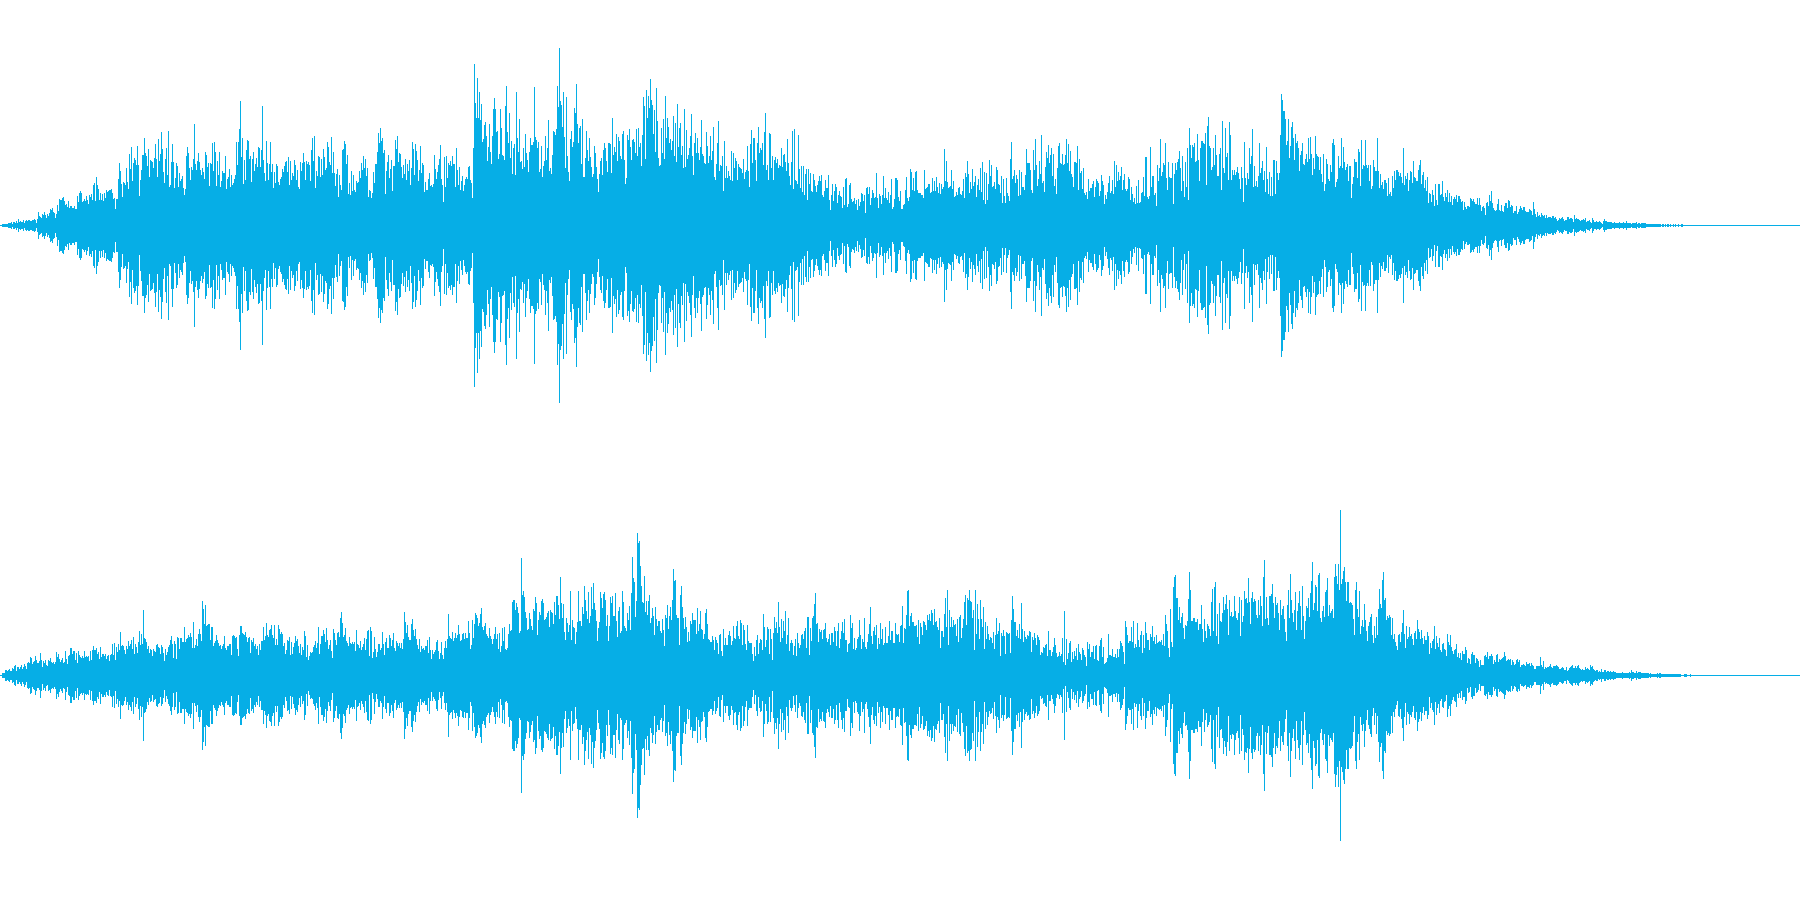 【SE 効果音】奇妙な音7の再生済みの波形